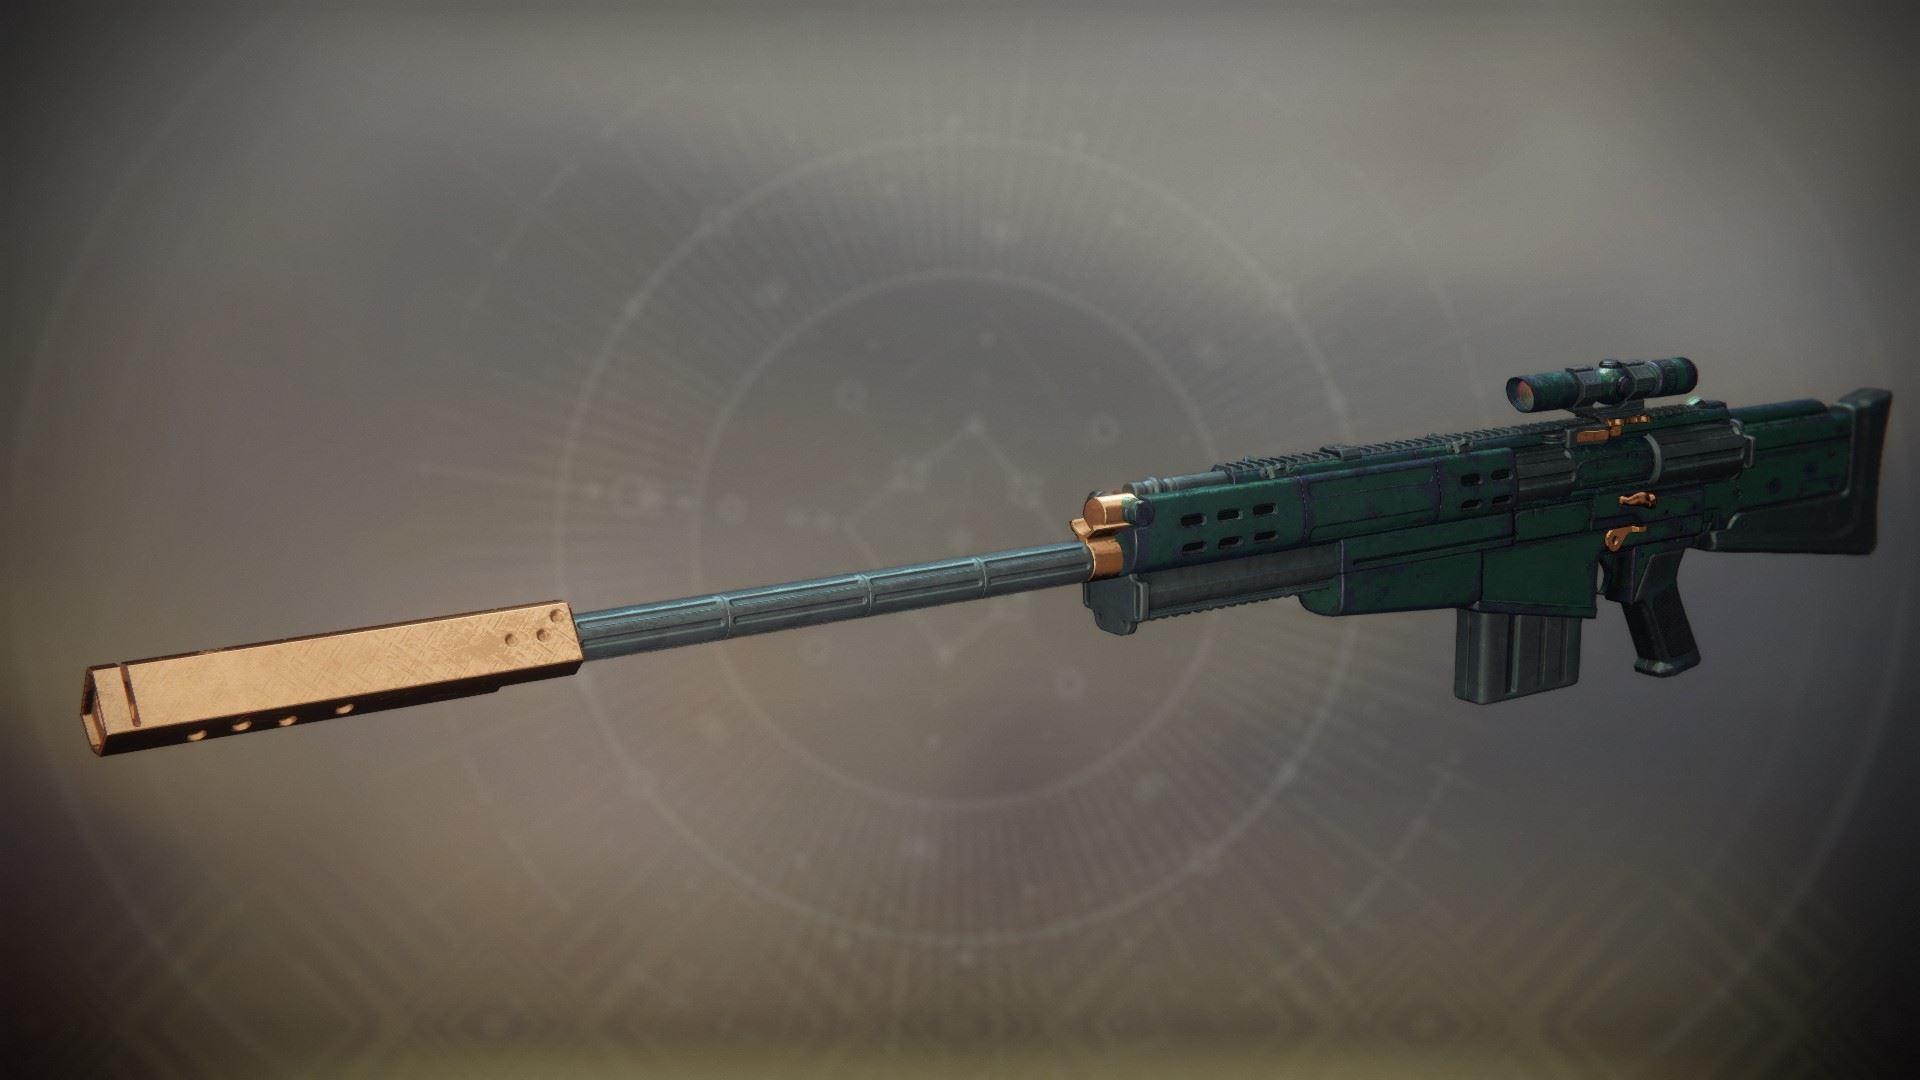 Destiny 2: Silikonneurom – Was kann die neue Nightfall-exklusive Sniper?